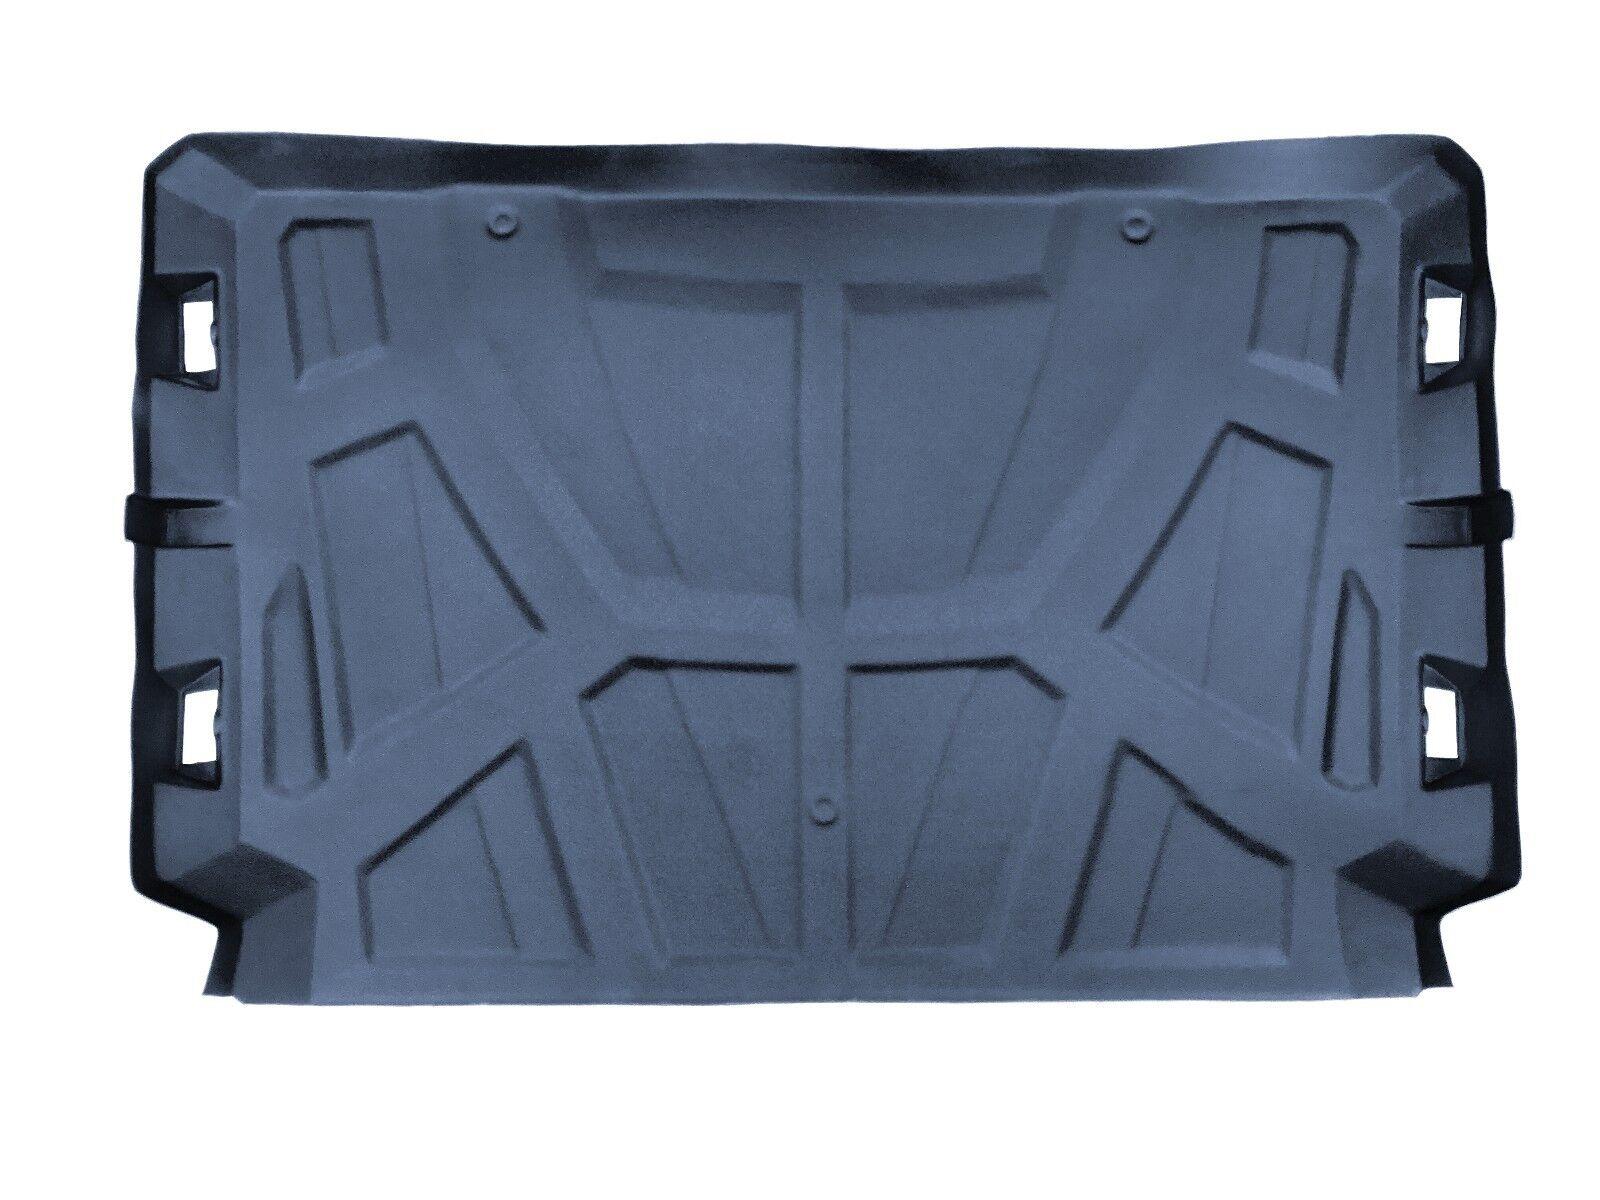 Treadliner 2016-2018 Polaris General rubber floor mats liners formed to fit